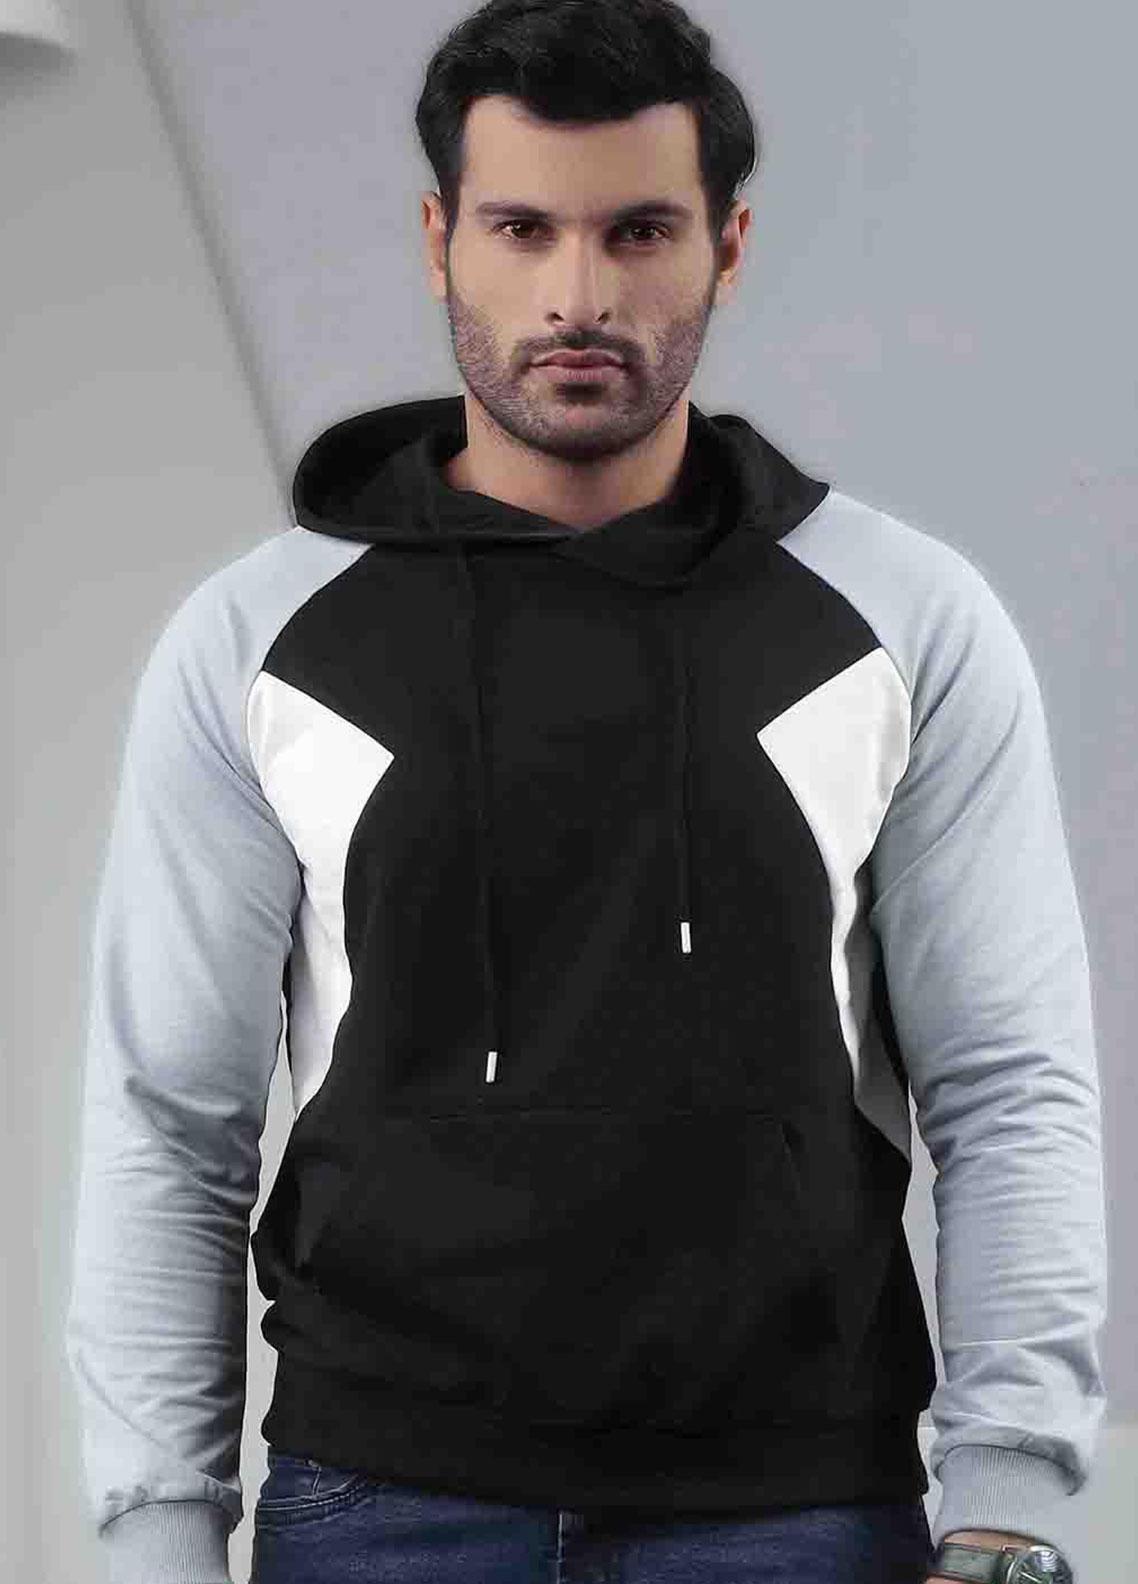 Ignite Wardrobe Cotton Tricolor Hoodies for Men -  IG20HDM 005